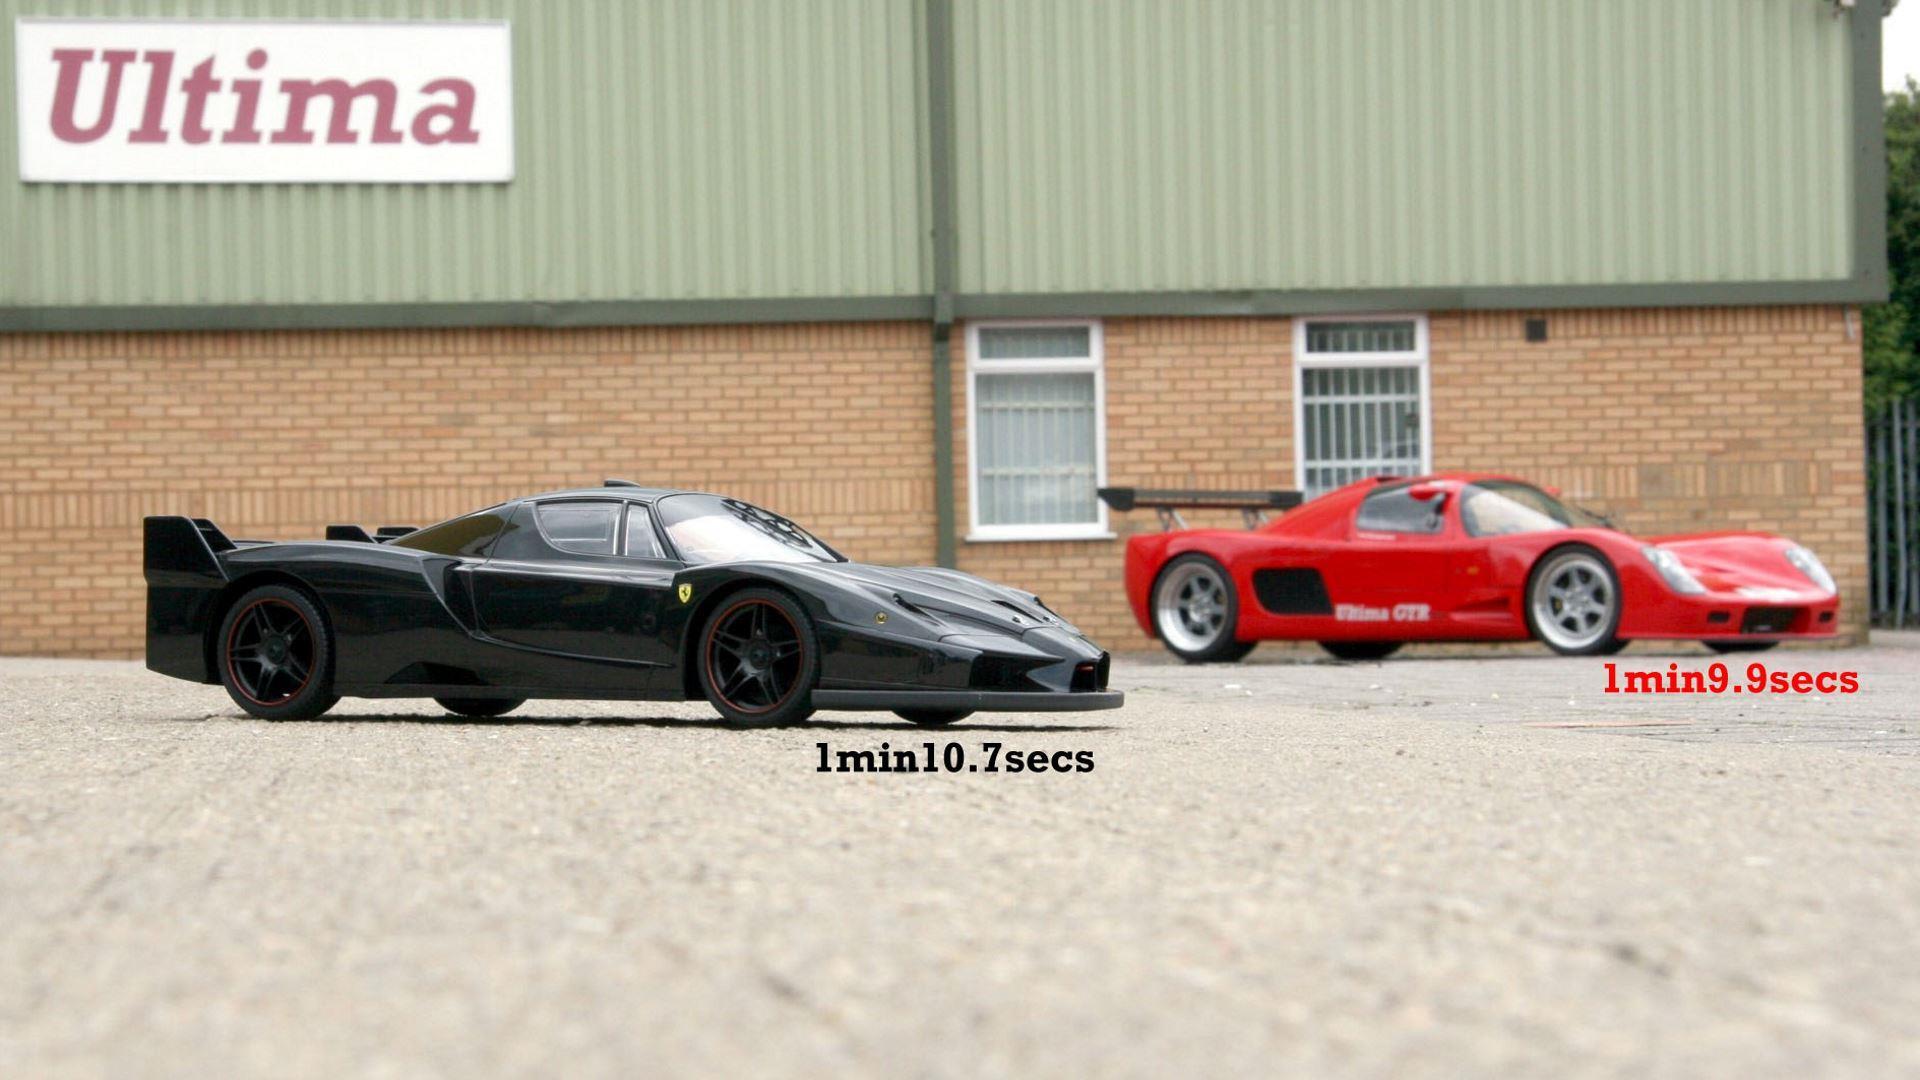 Ultima GTR faster then Ferrari FXX